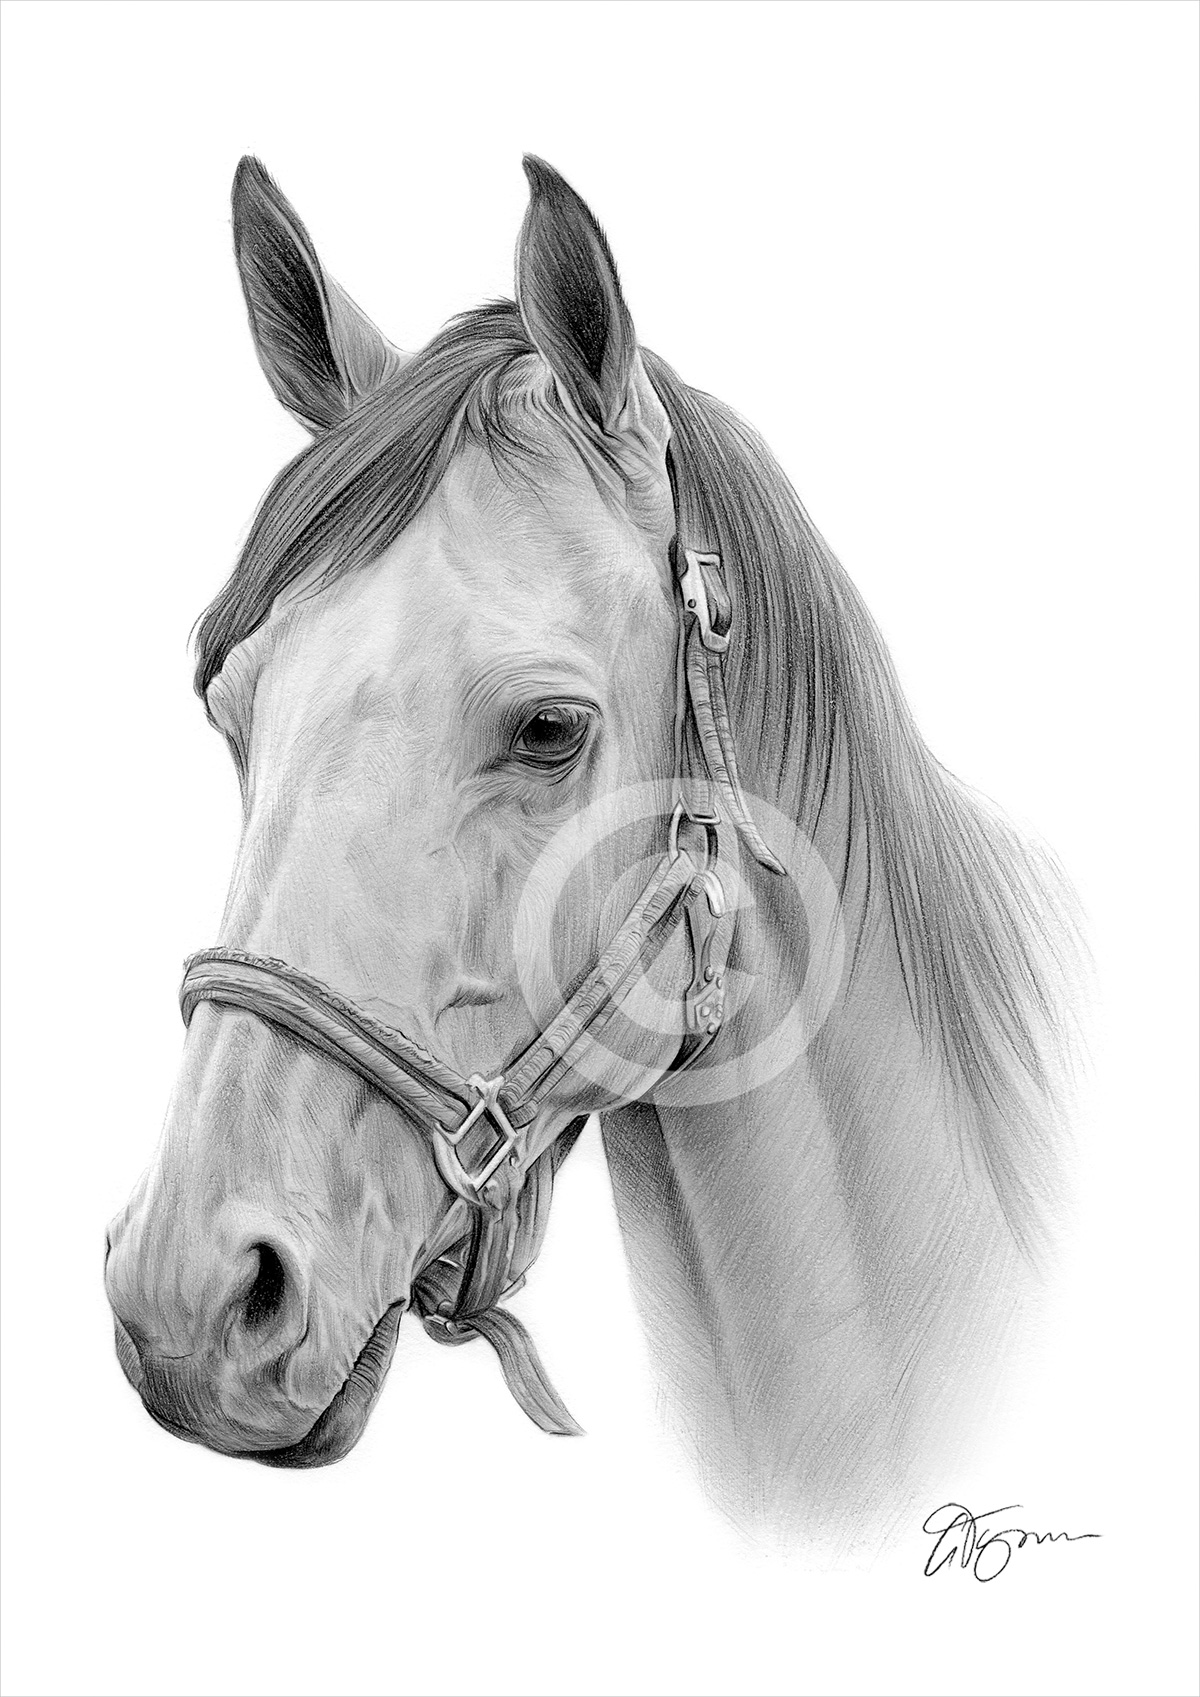 Horse pencil drawing by artist gary tymon